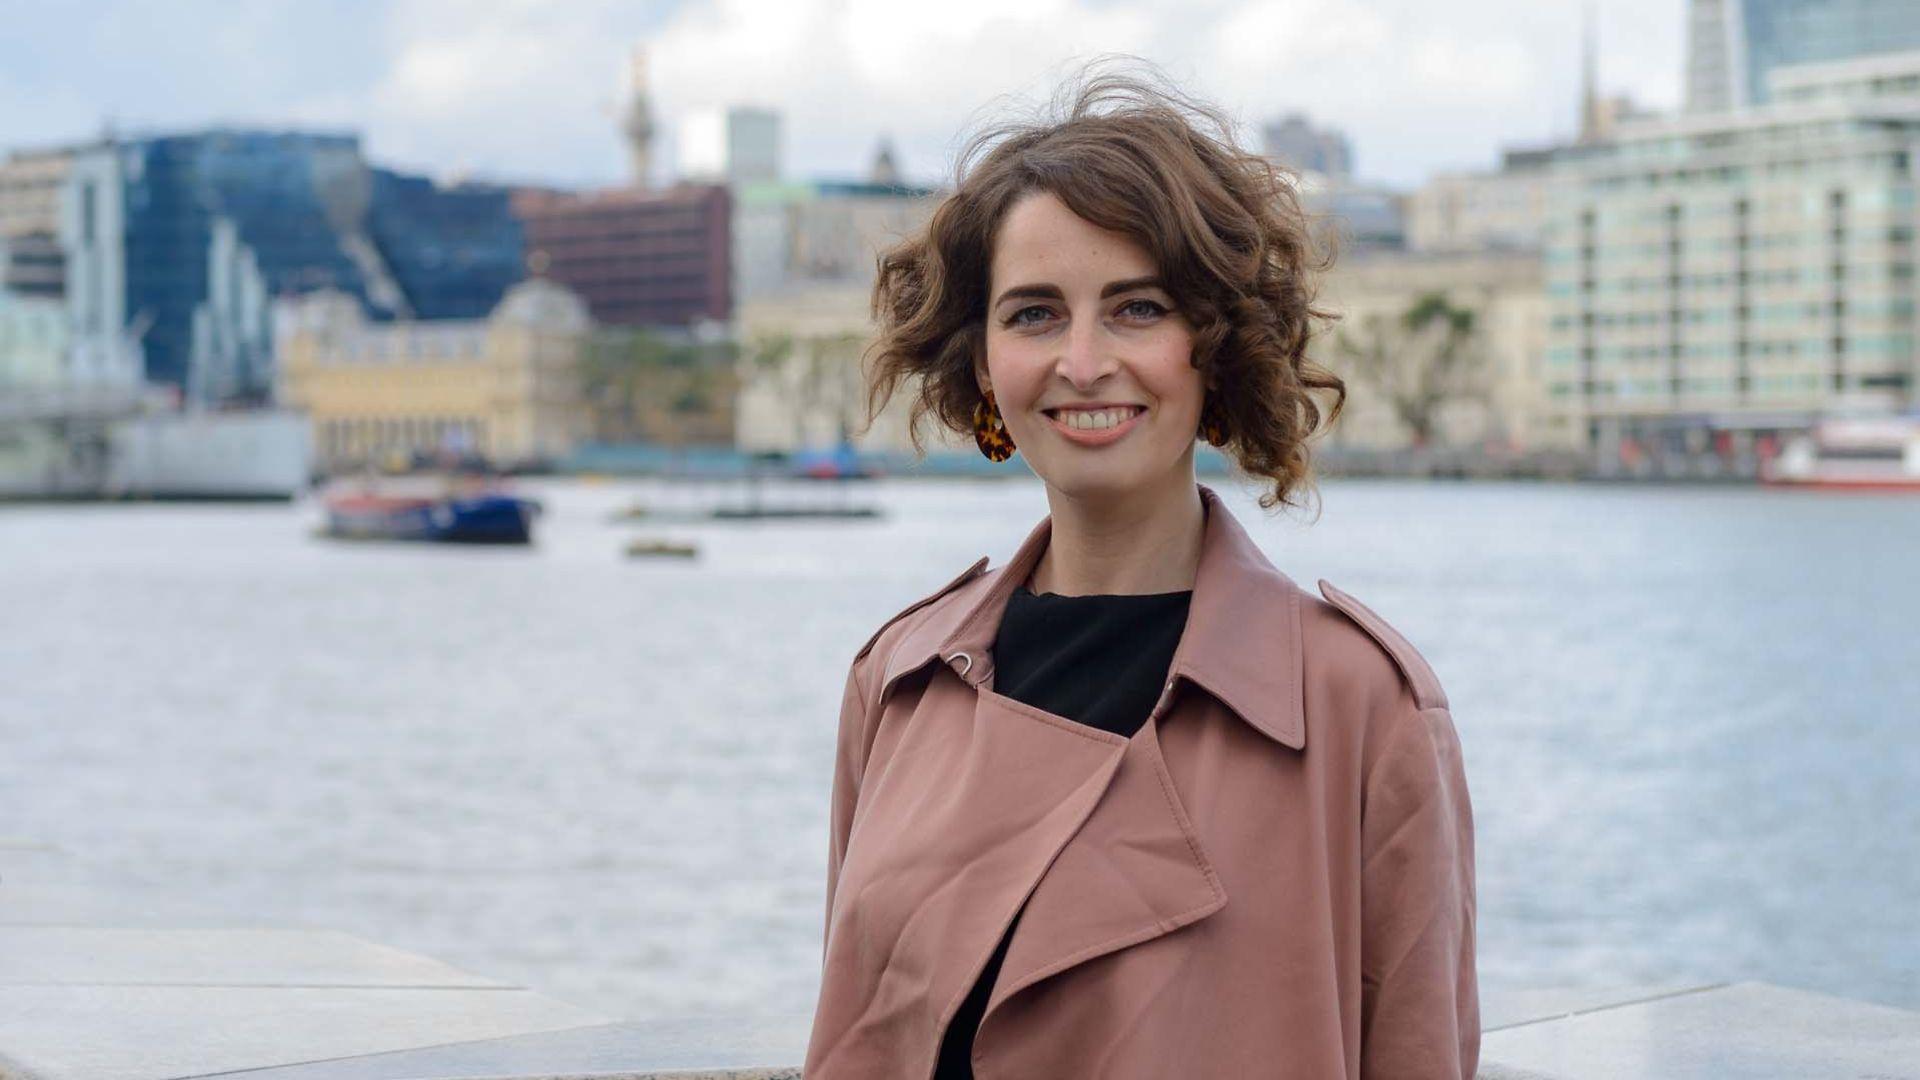 Luisa Porritt, the Liberal Democrat candidate for mayor of London - Credit: Sarah King/Liberal Democrats